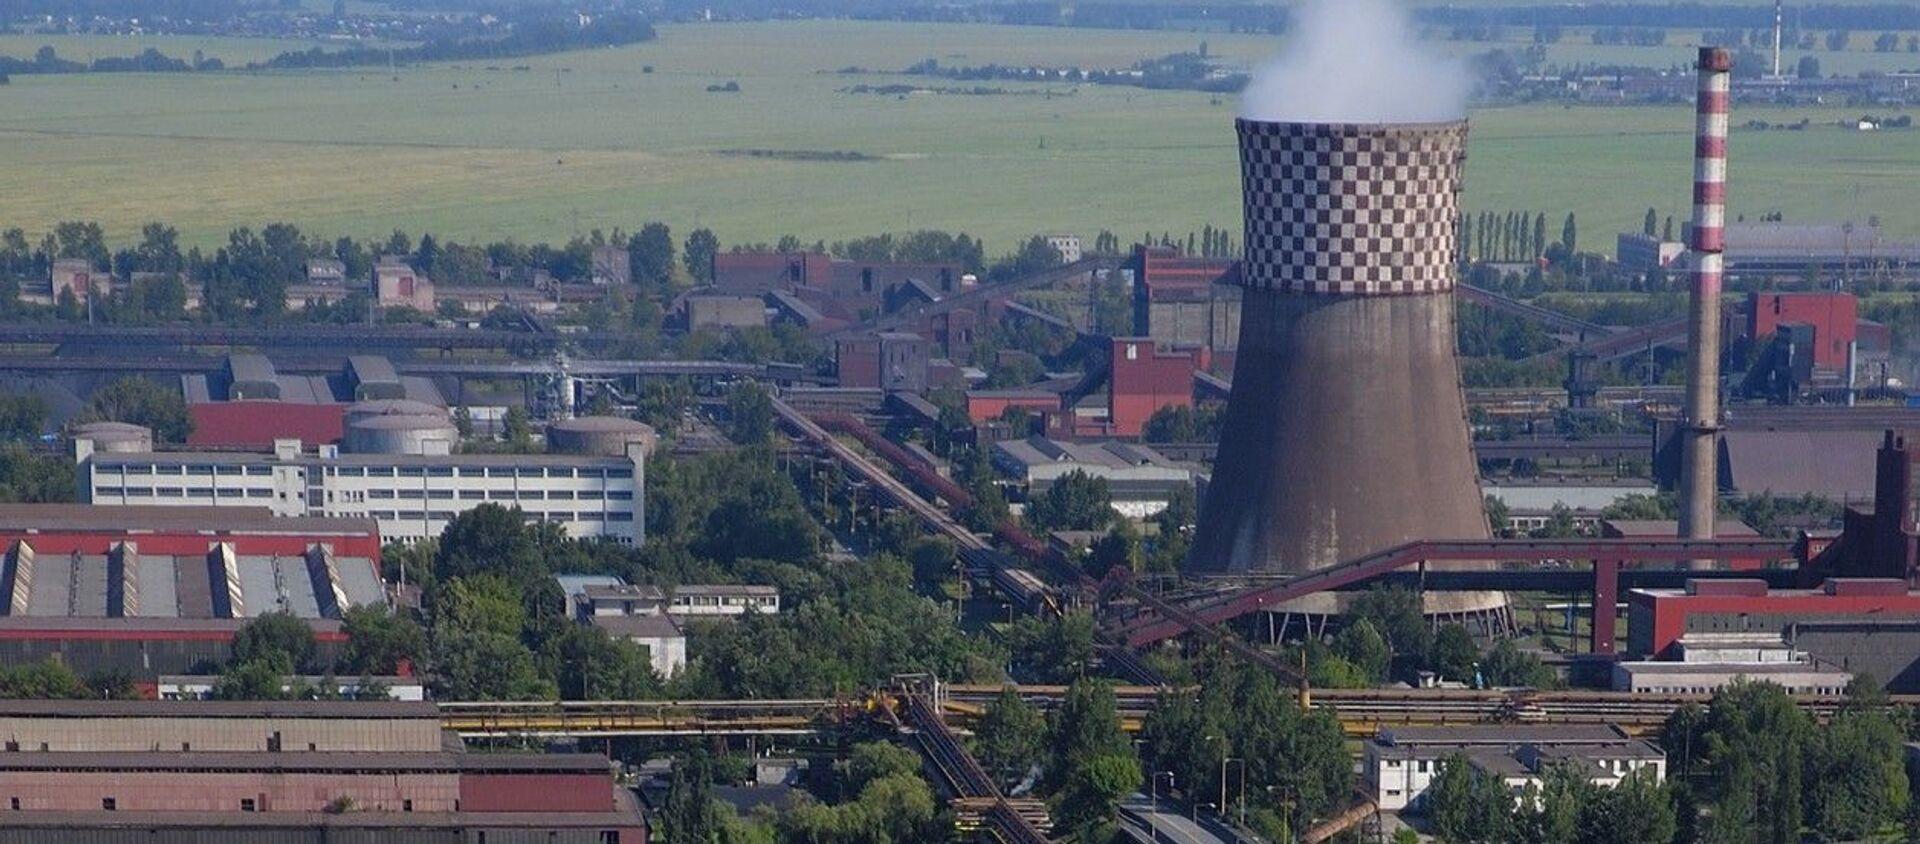 U. S. Steel Košice - Sputnik Česká republika, 1920, 27.02.2021